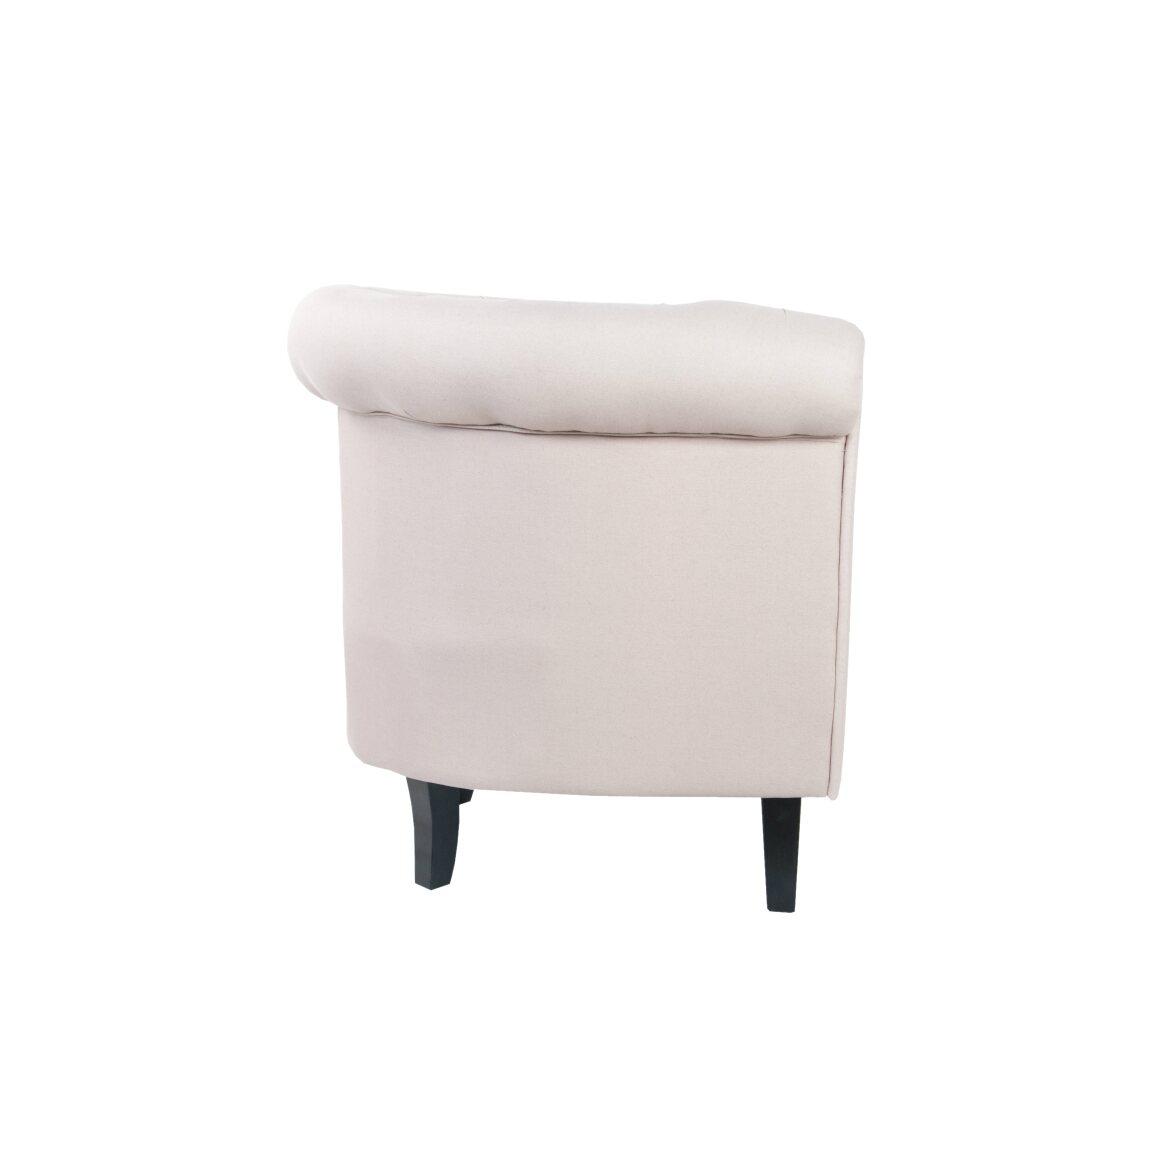 Кресло Swaun beige 2 | Маленькие кресла Kingsby